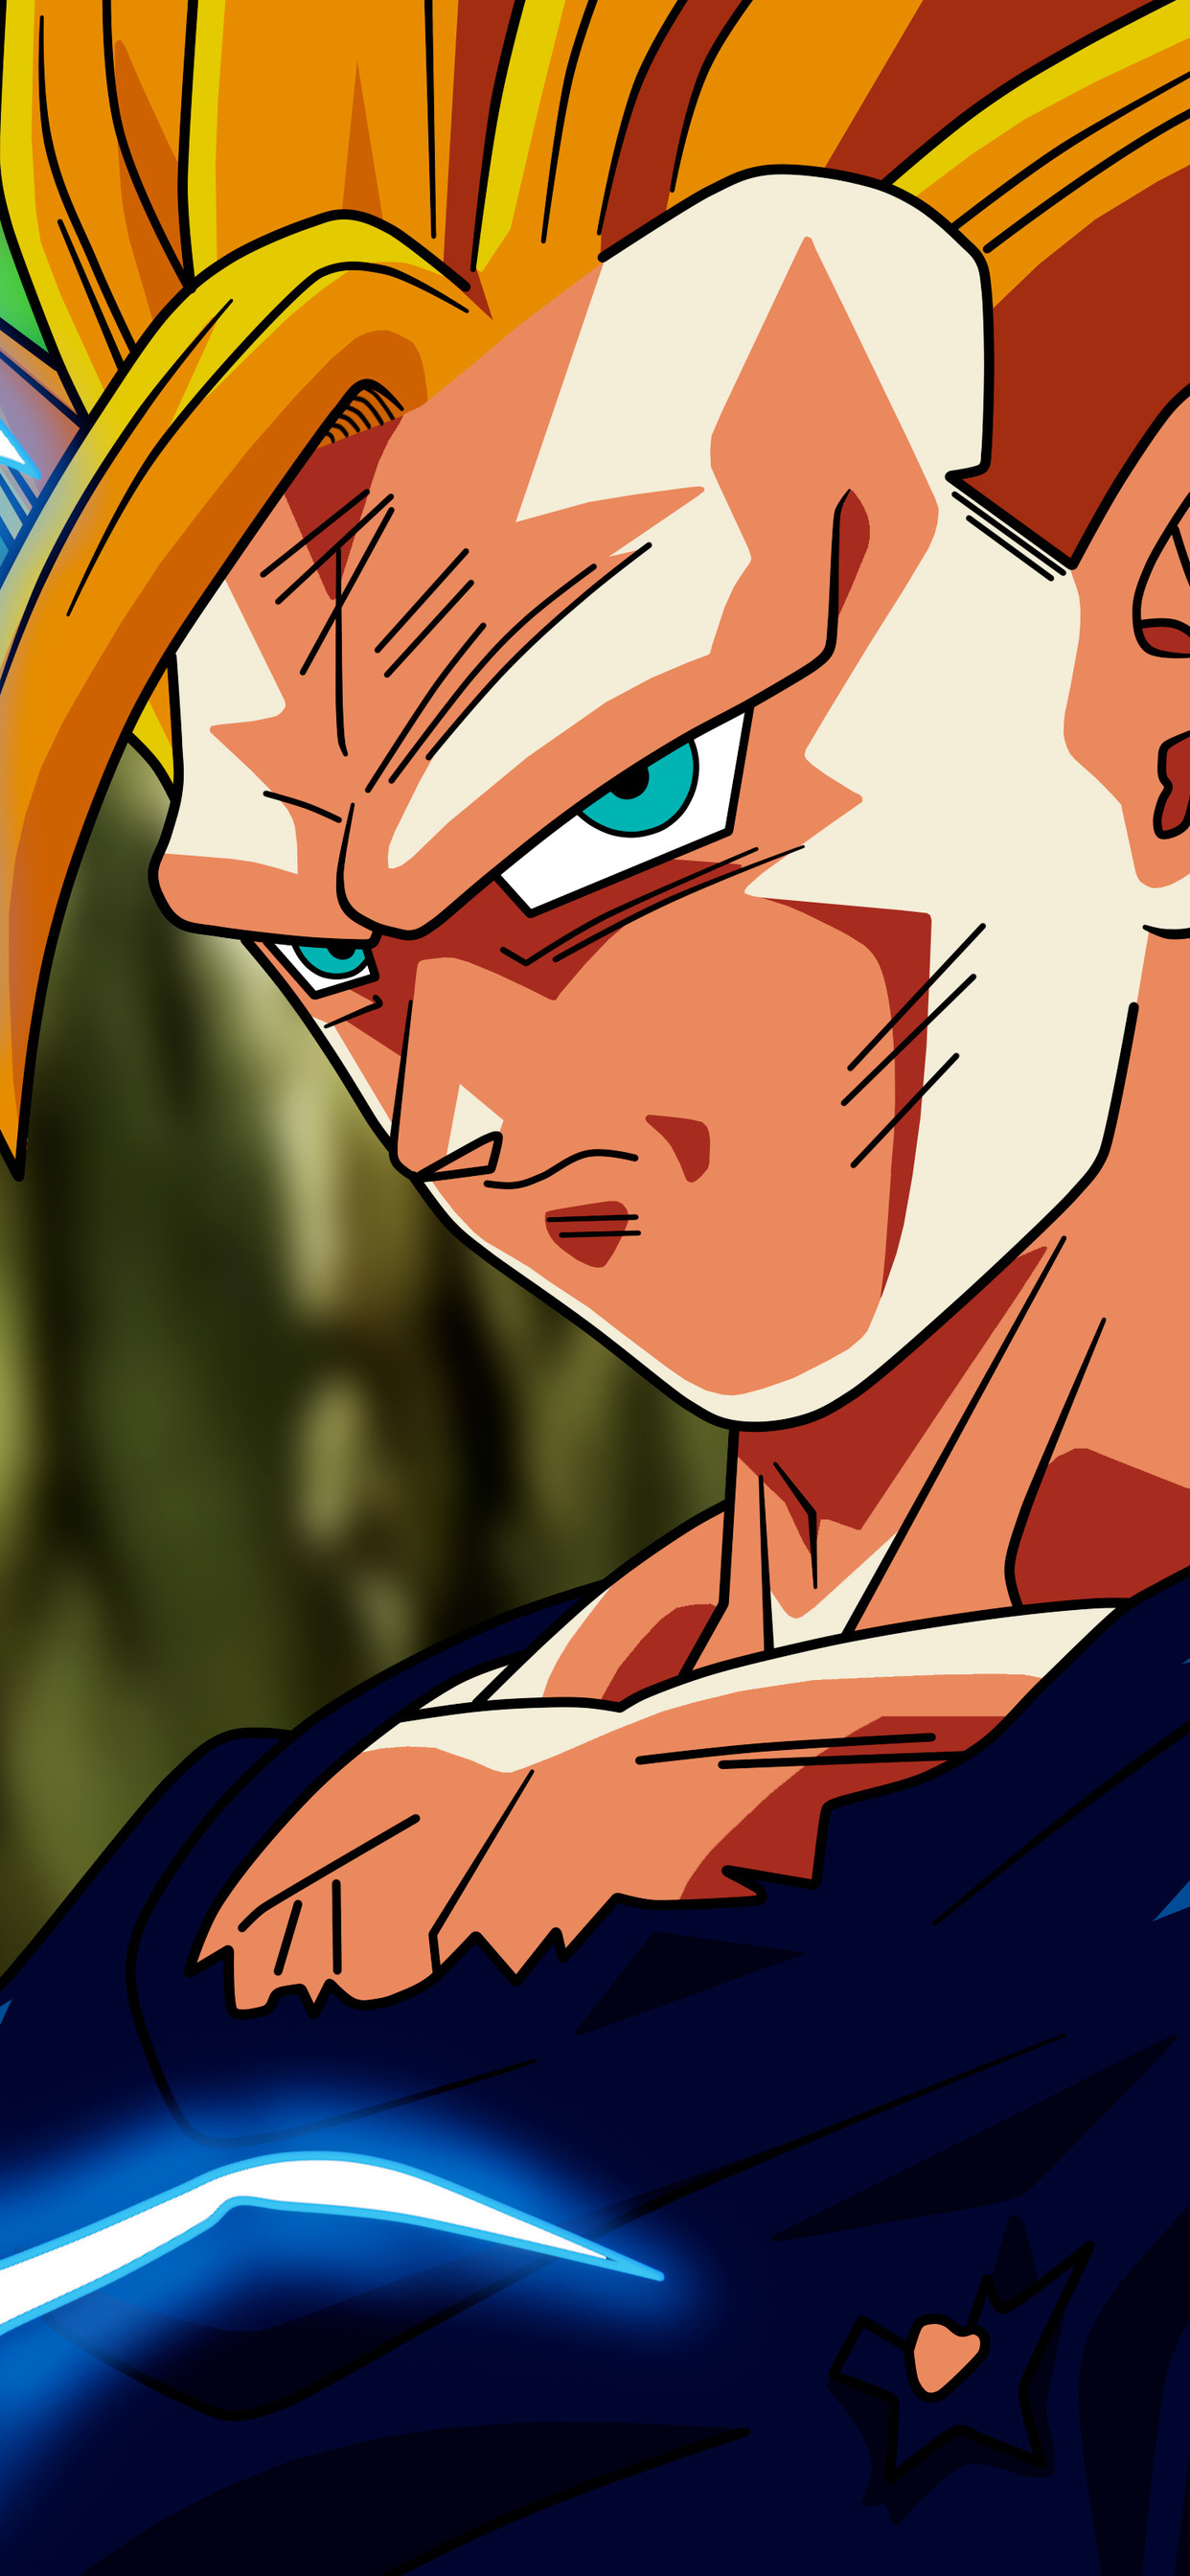 1242x2688 Goku Anime Dragon Ball Super 5k Iphone Xs Max Hd 4k